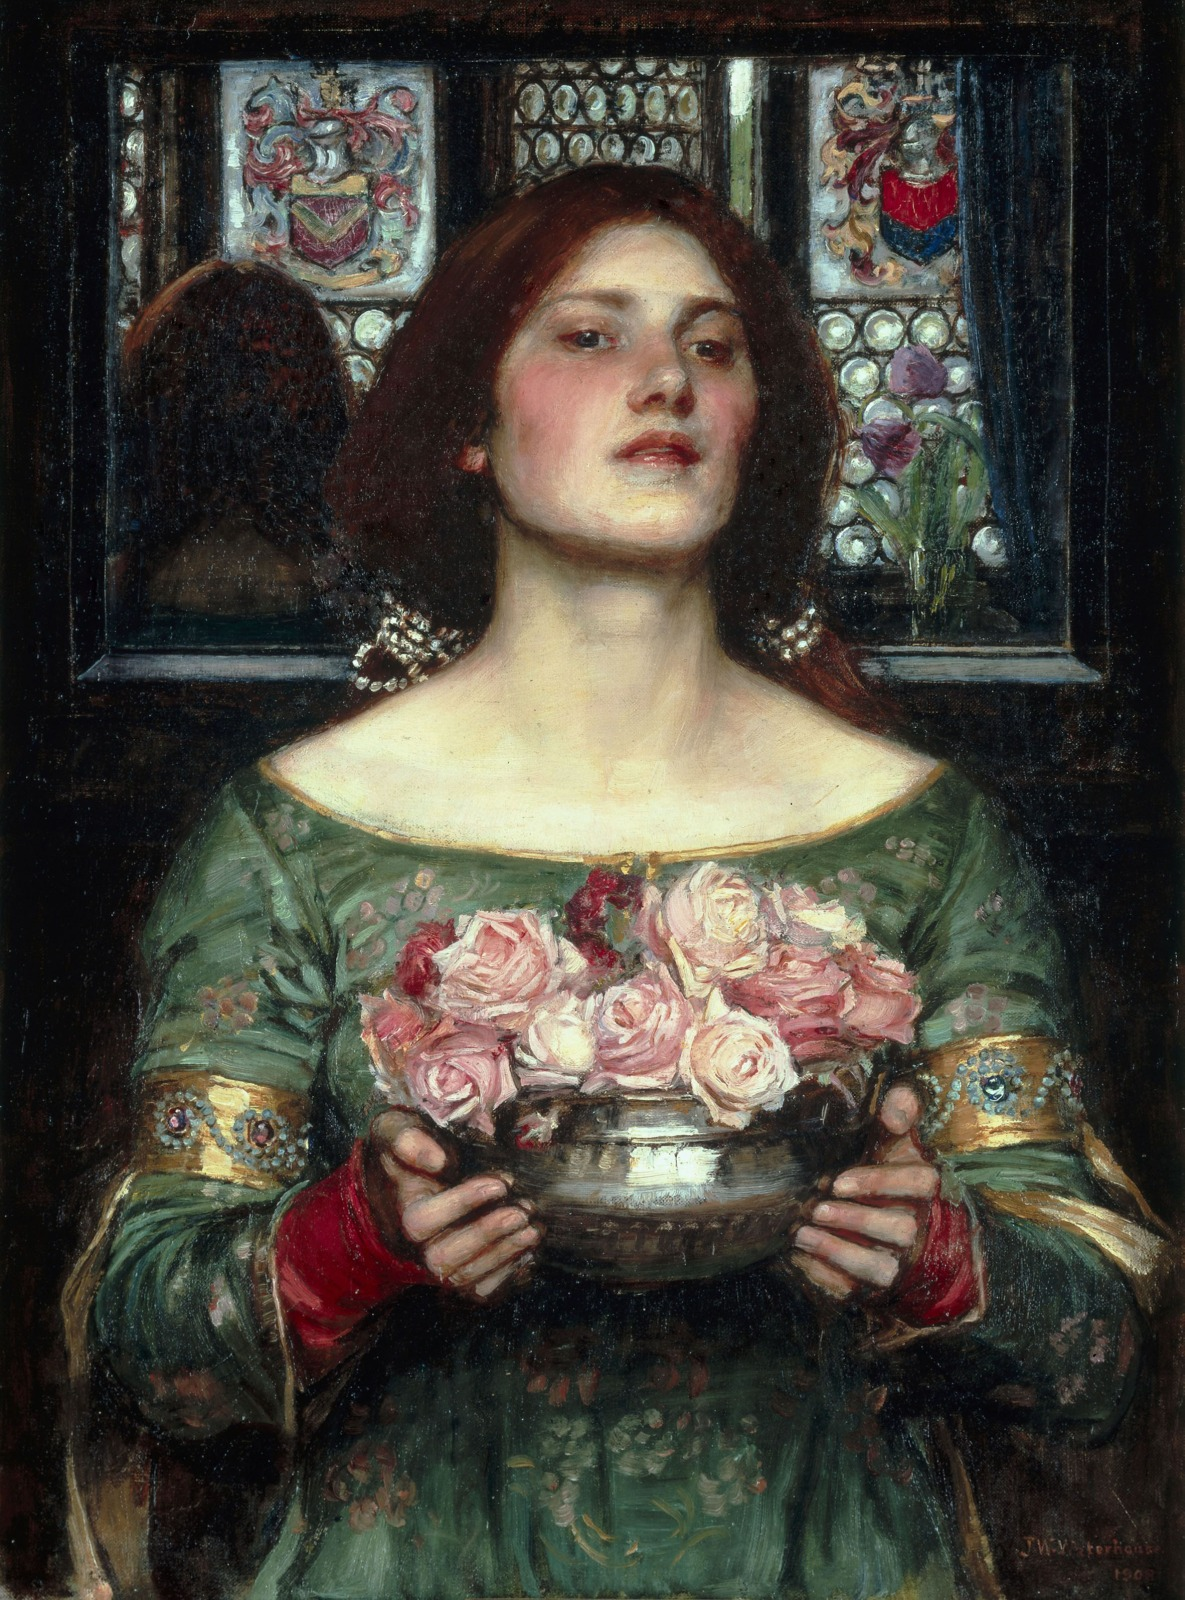 """Gather Ye Rosebuds While Ye May"" by John William Waterhouse - Licensed under Public Domain via Wikimedia Commons"